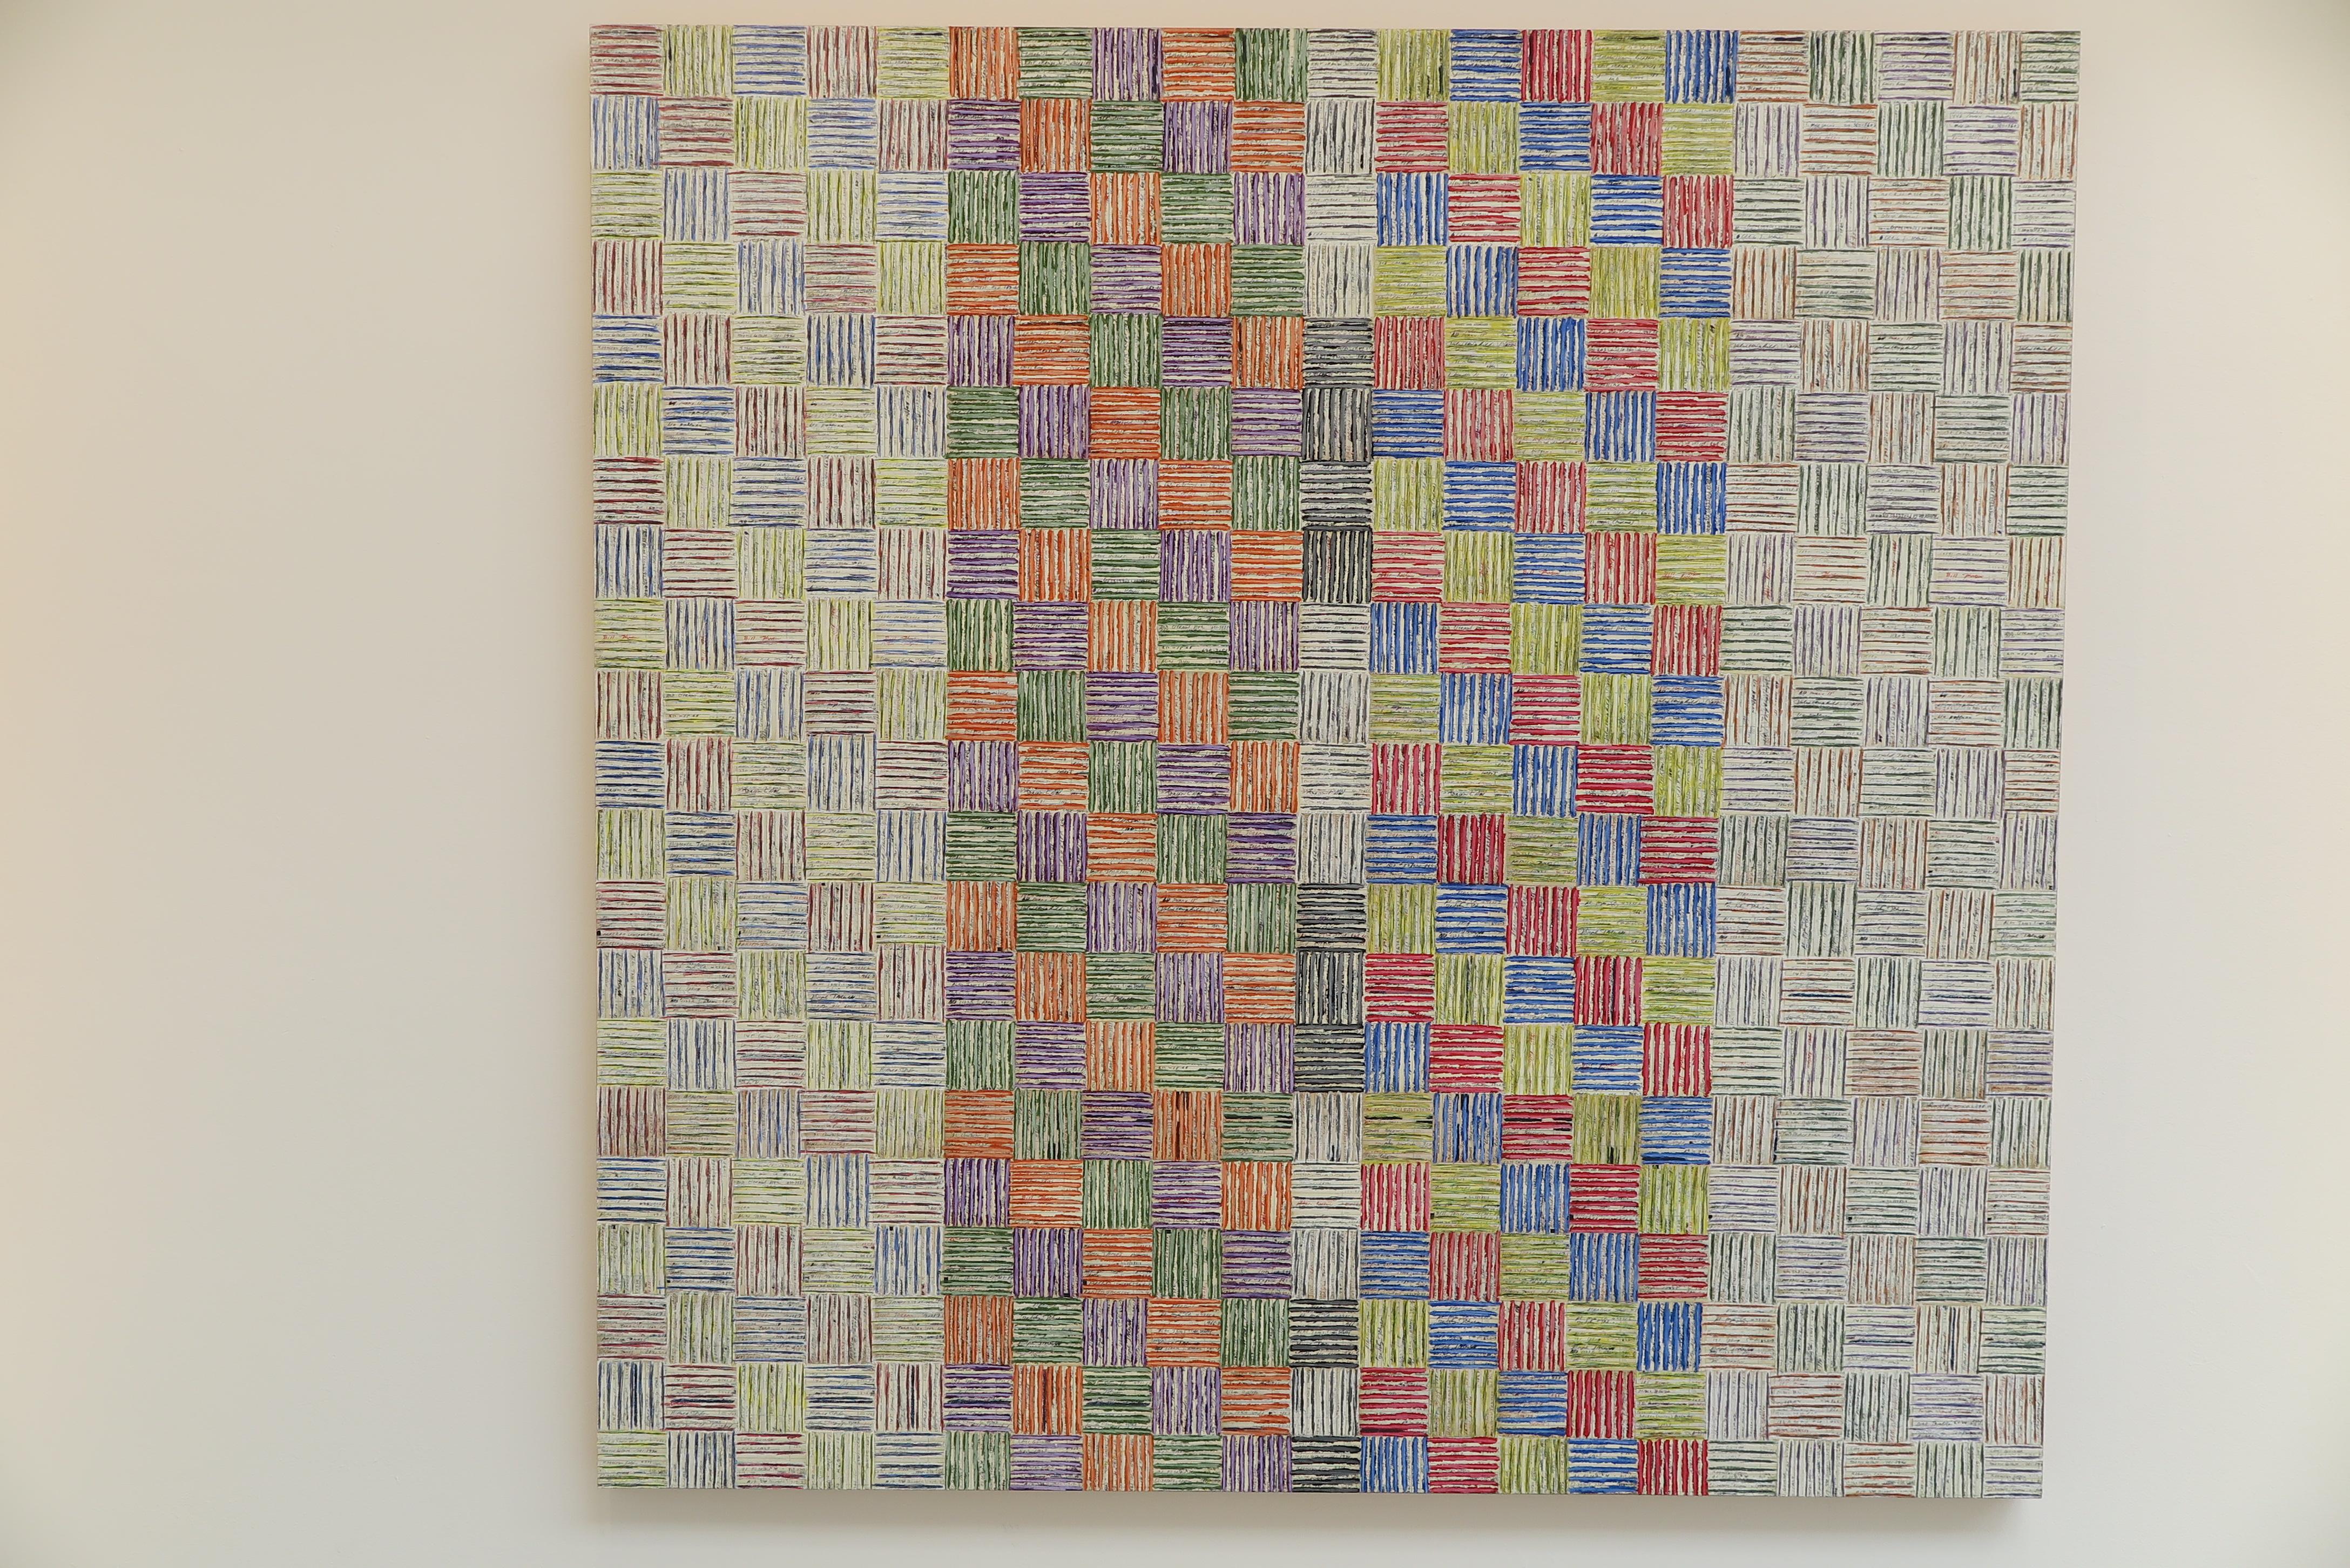 Hoofexpositie Giardini - Mc Arthur Binion